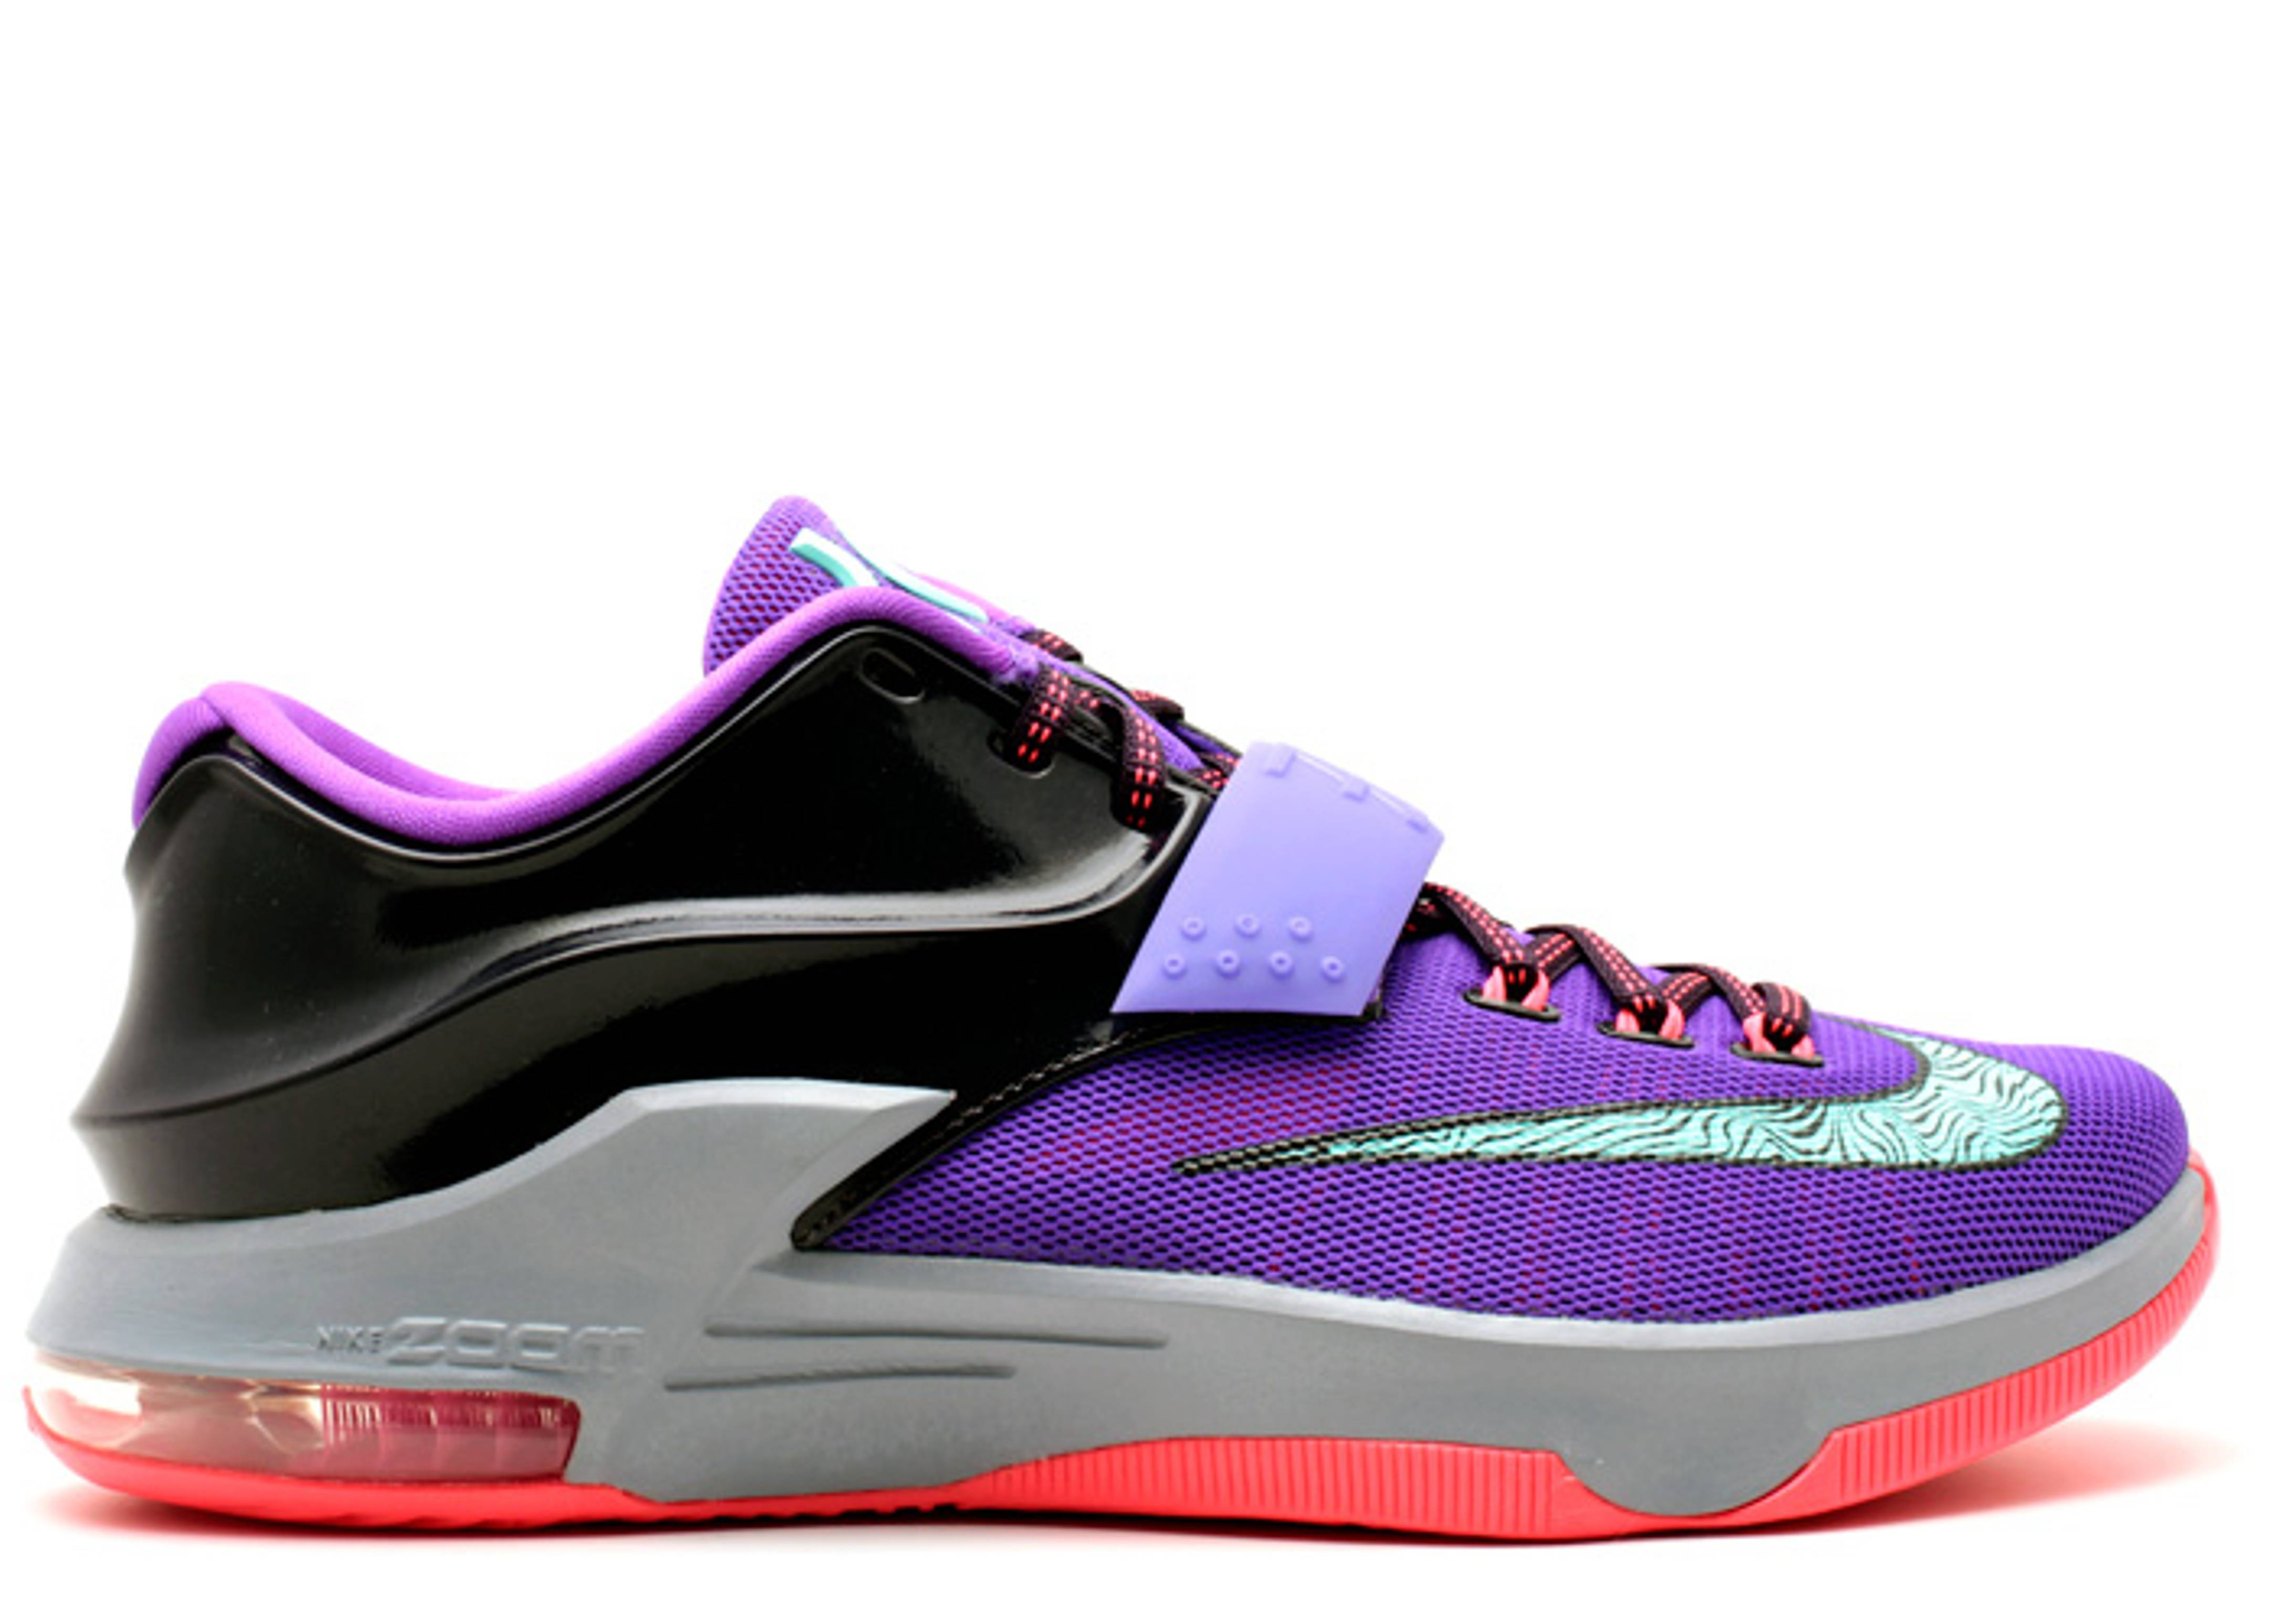 kd 7 cave purple nike 653996 535 cv prpl blchd trq hypr grp